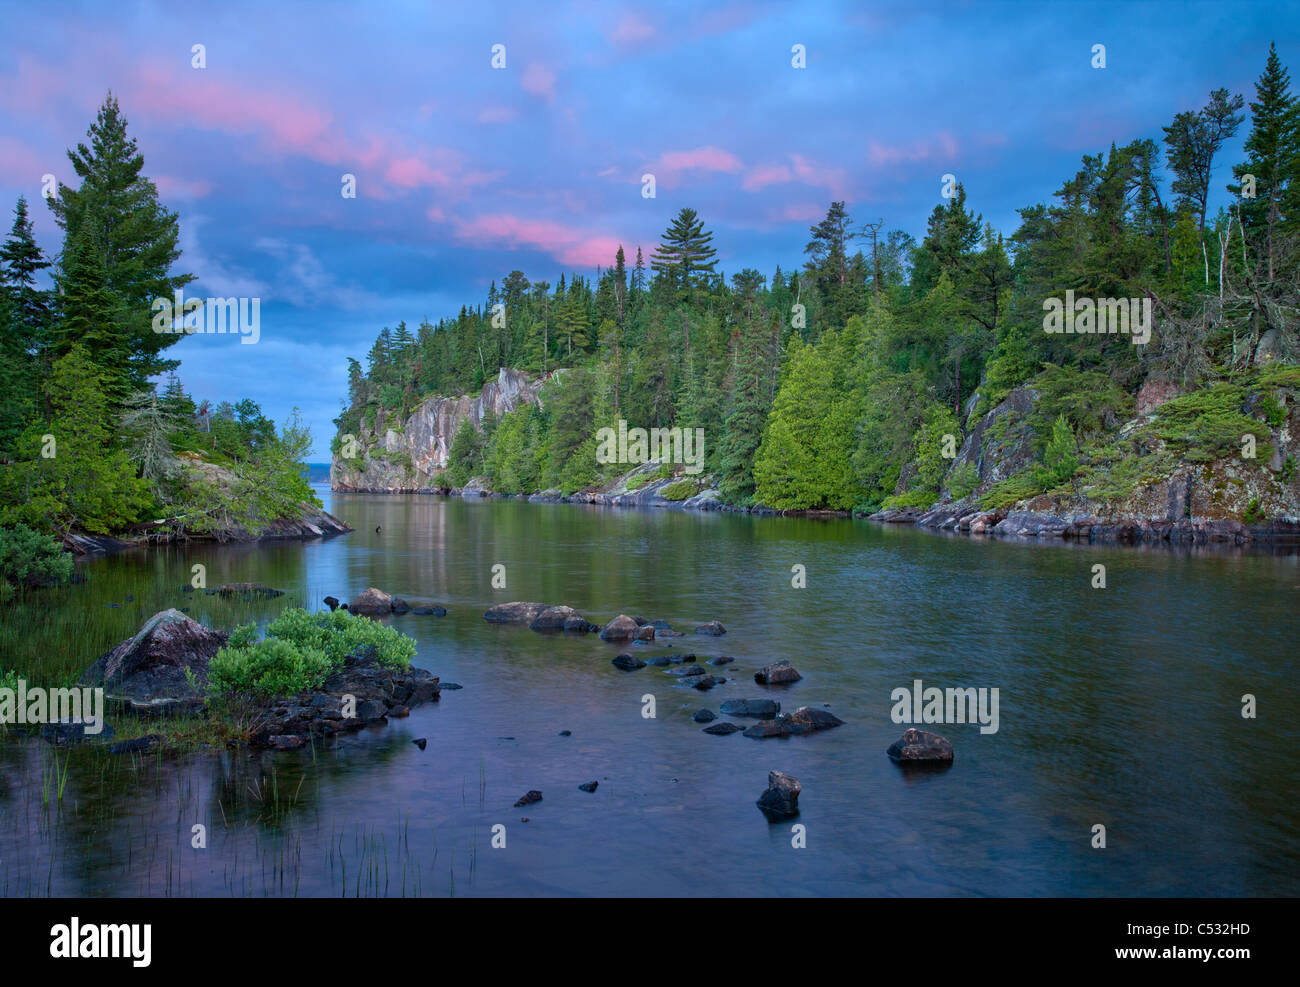 Sea Gull Lake at sunrise, Boundary Waters Canoe Area Wilderness, Superior National Forest, Minnesota Stock Photo